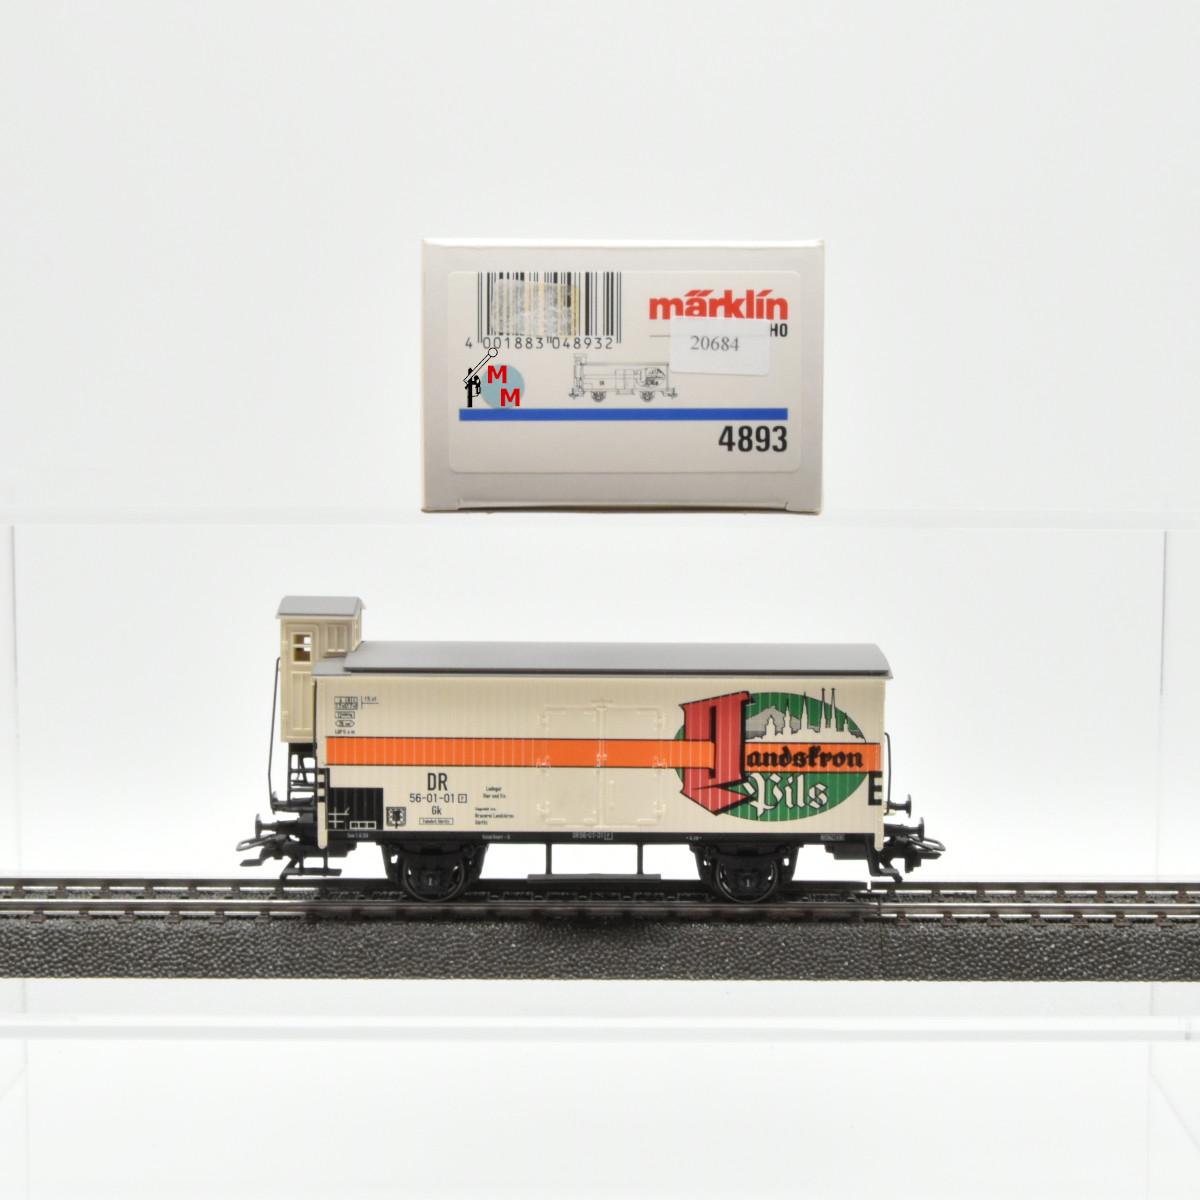 "Märklin 4893 Bierwagen der DR, ""Landskron Pils"", (20684)"